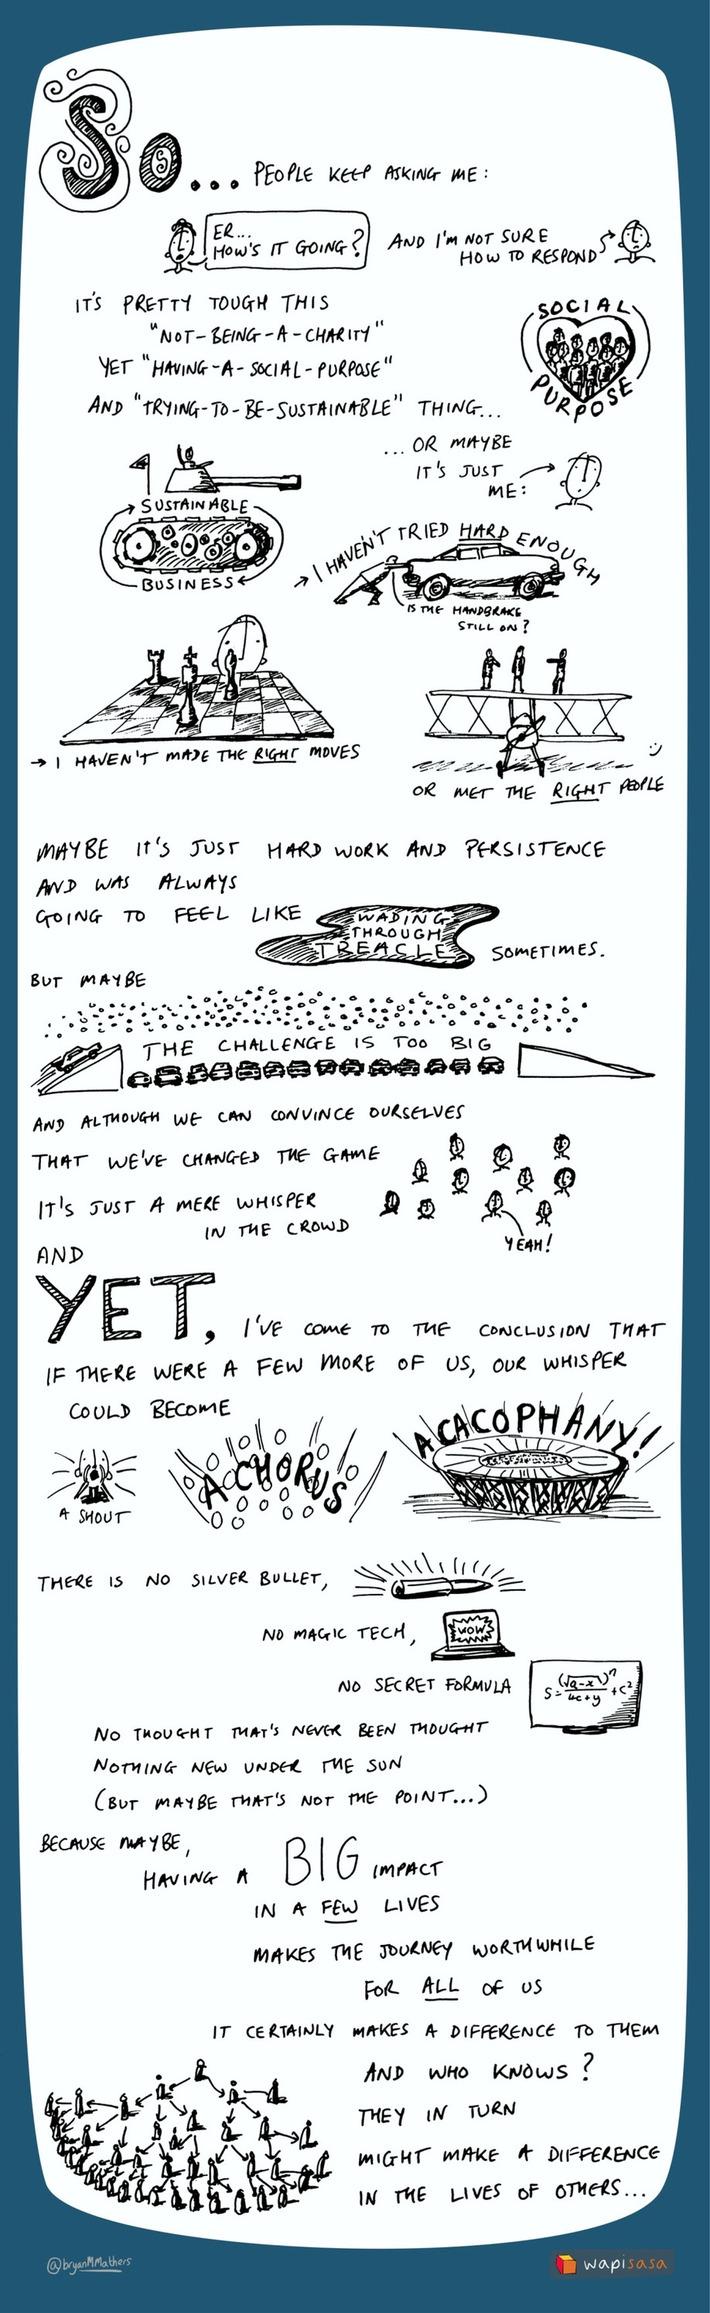 Bryan Mathers - Visual Thinkery | Coaching Leaders | Scoop.it